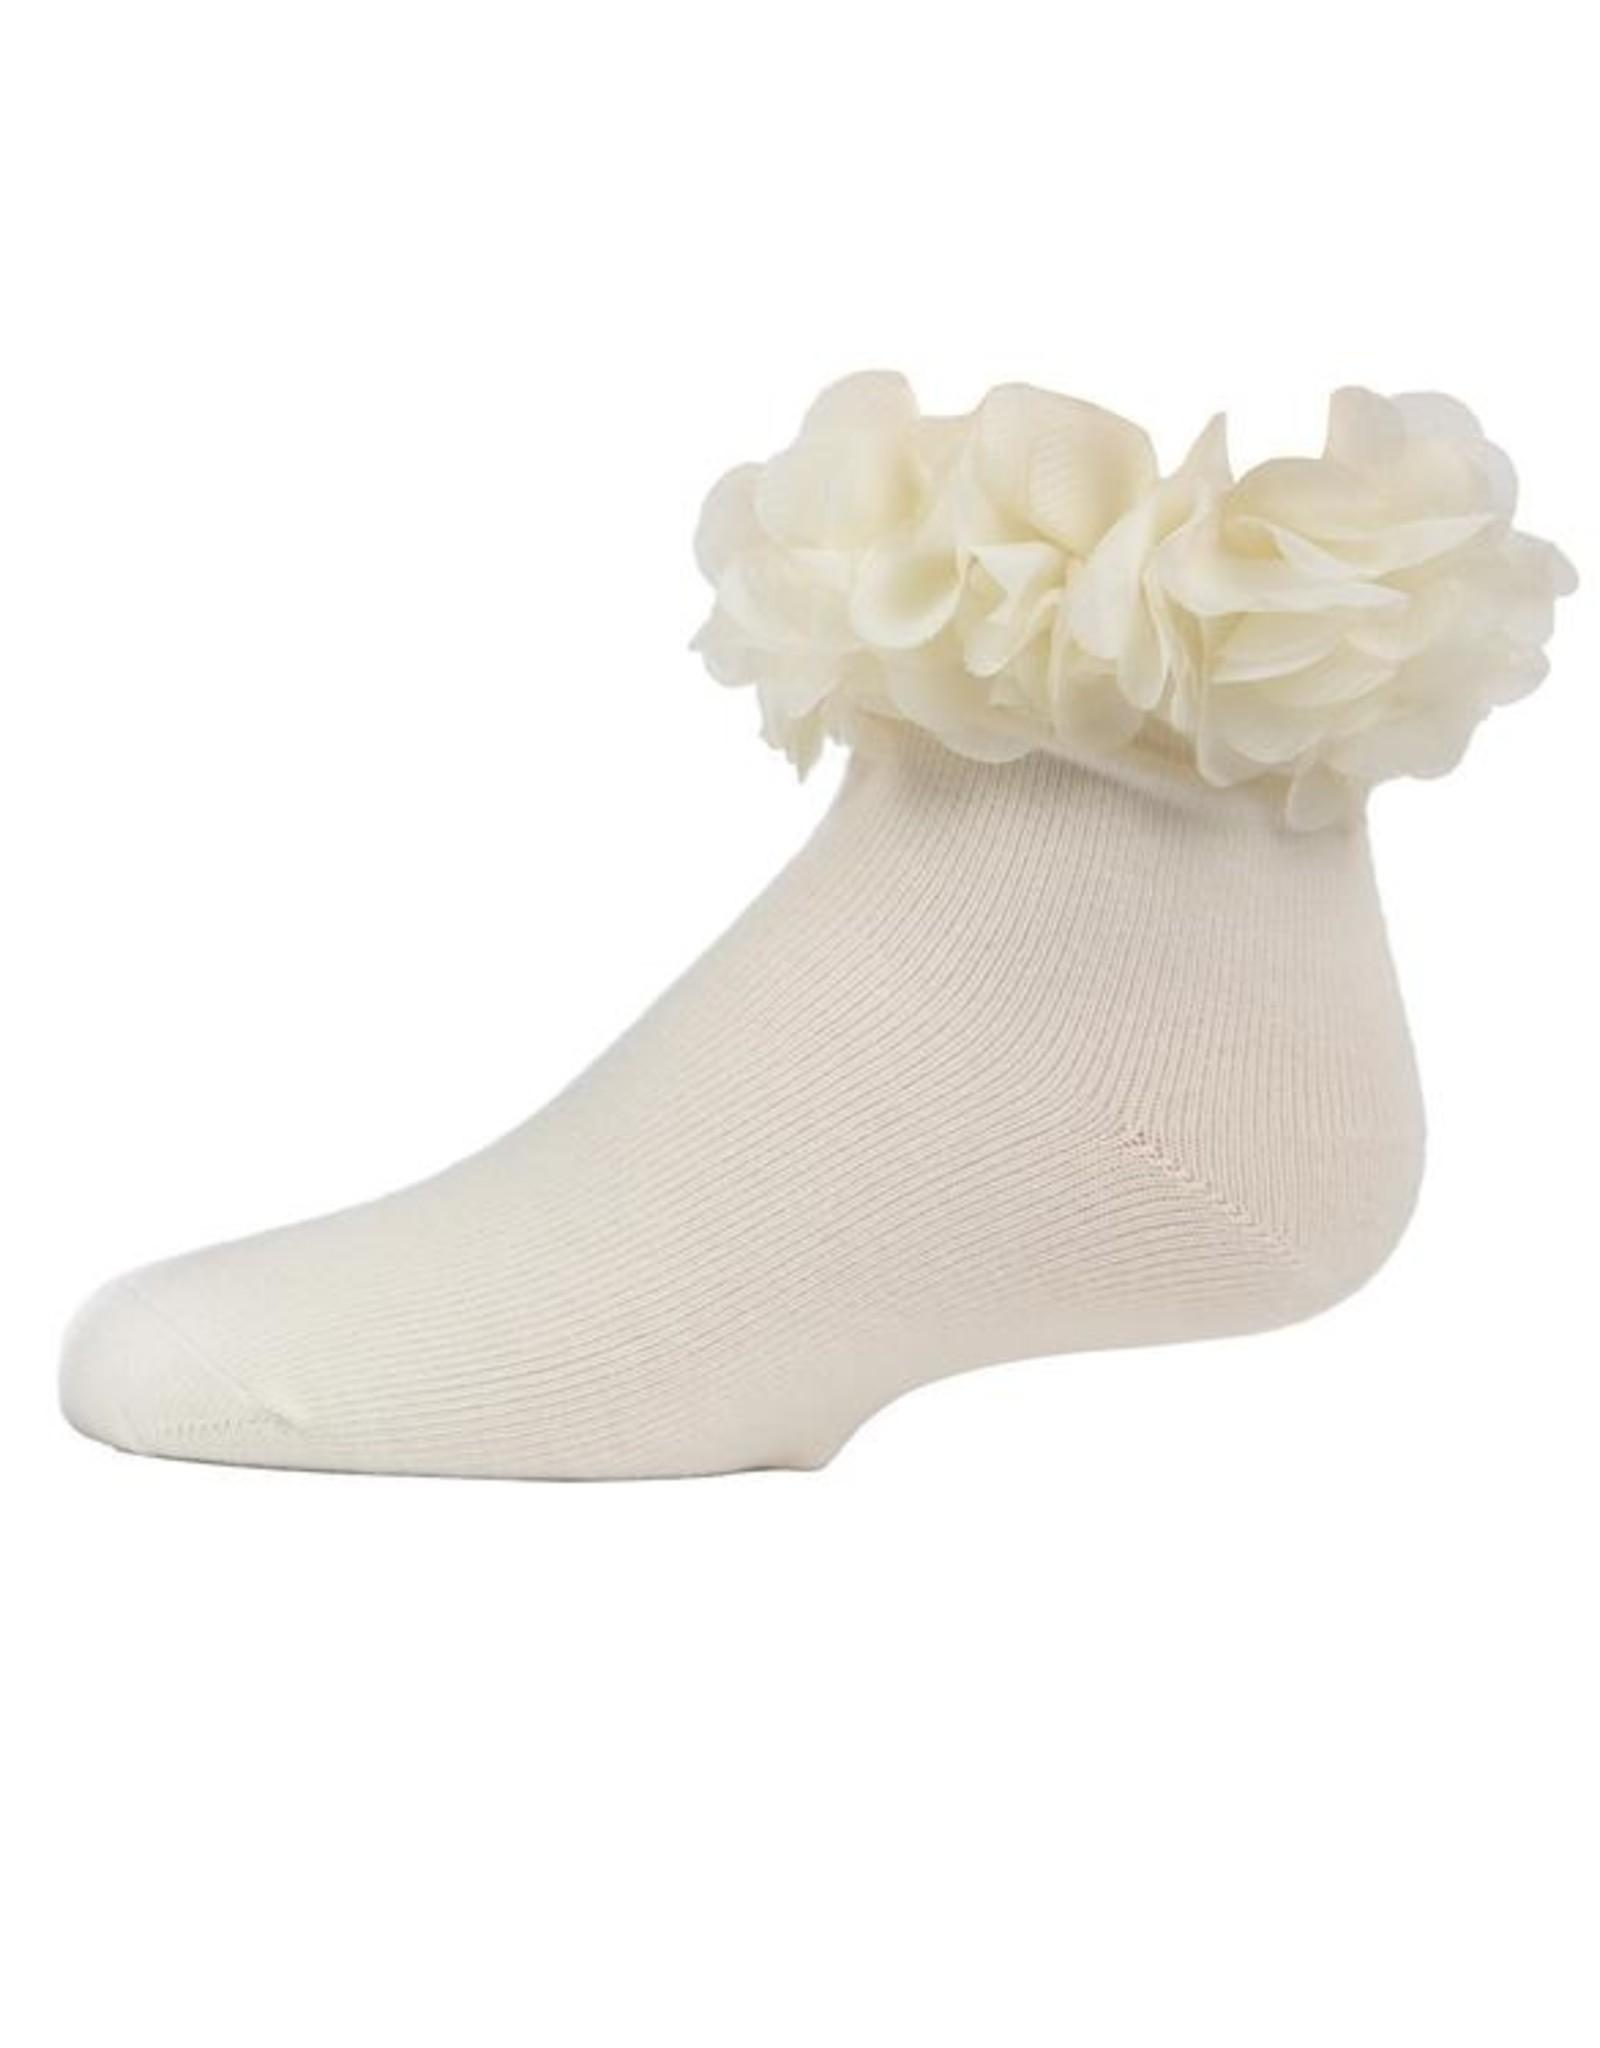 Memoi Memoi Floral Halo Anklet